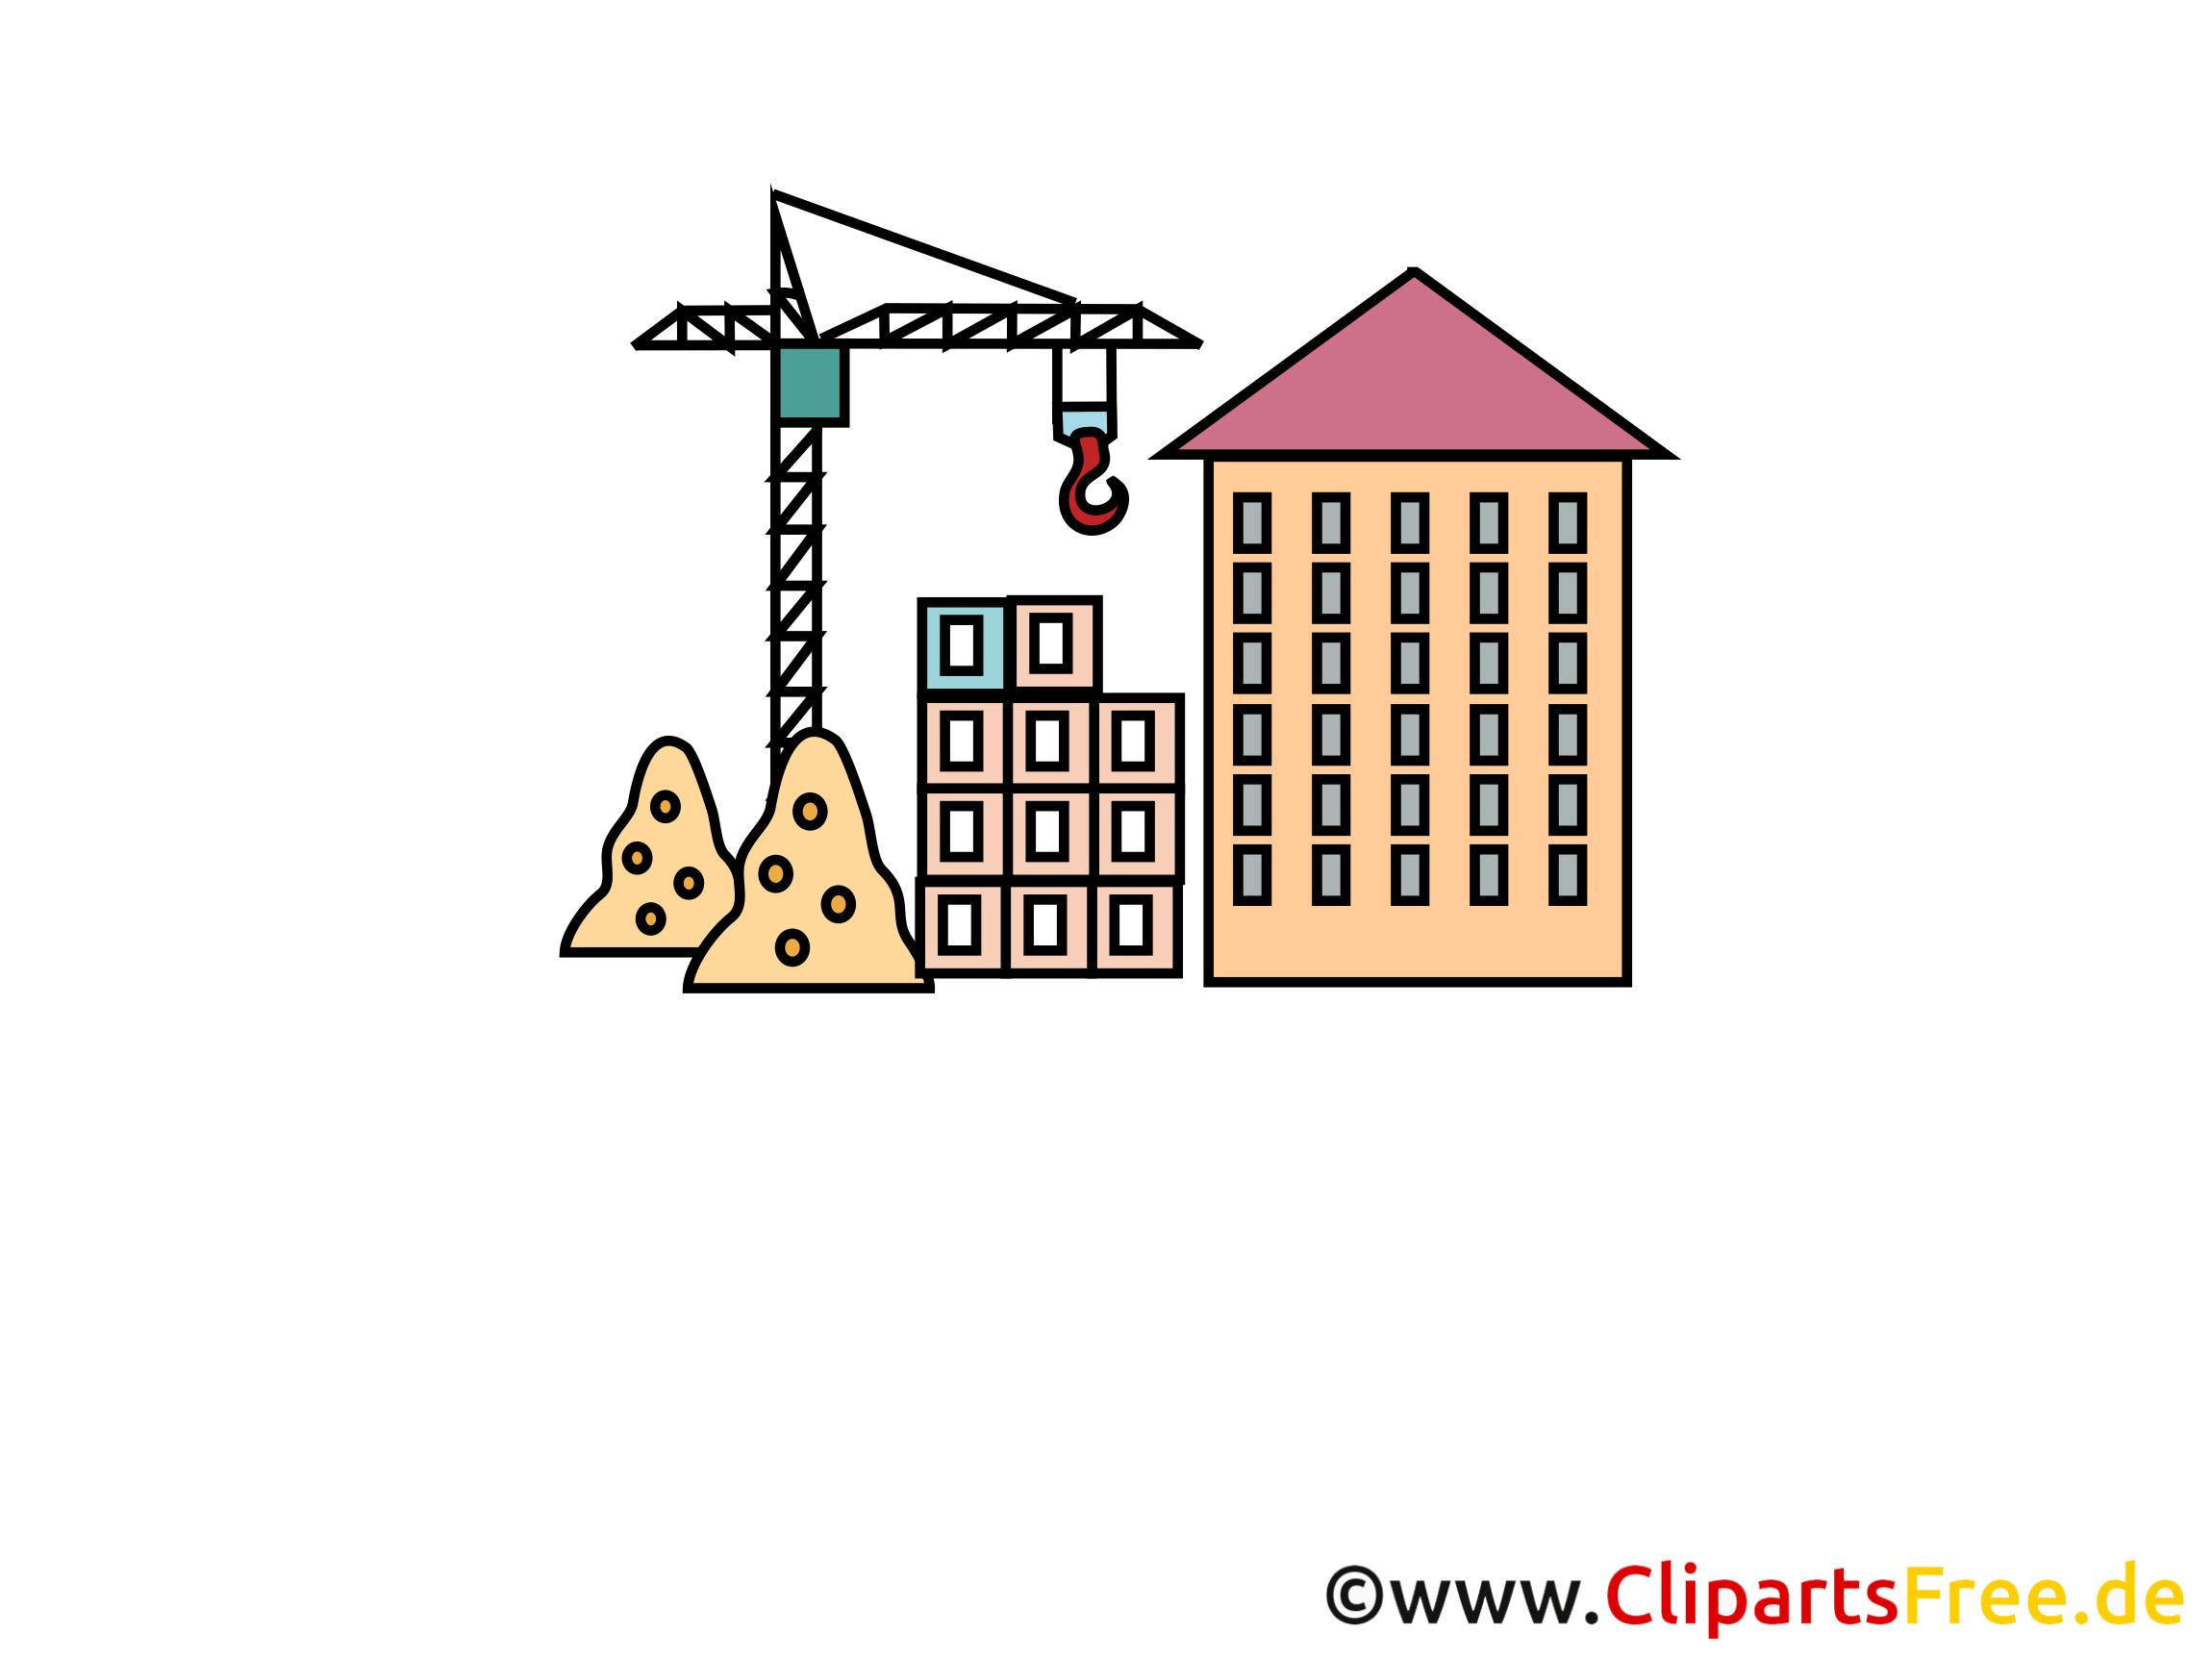 Hausbau zeichnung  Neubau, Hausbau Clipart, Cartoon, Bild, Grafik